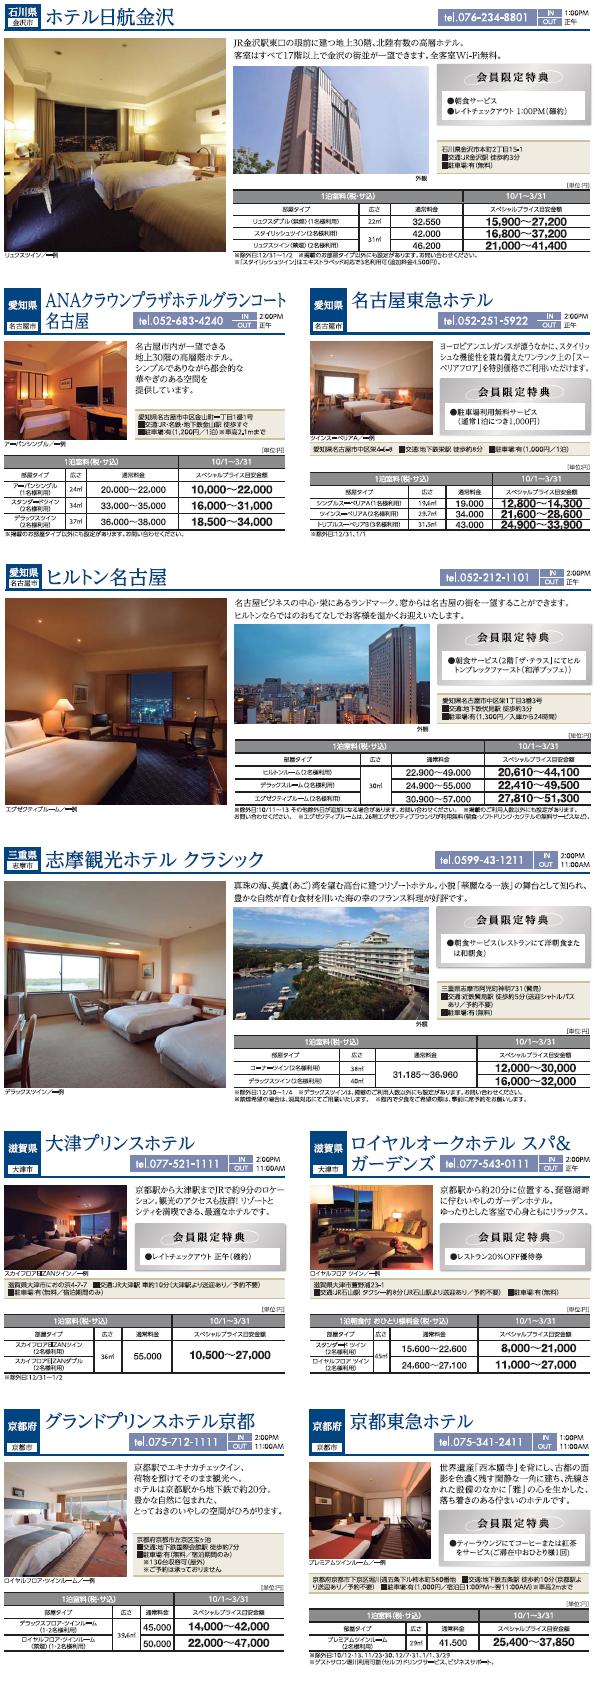 special_price_ plan1309 05